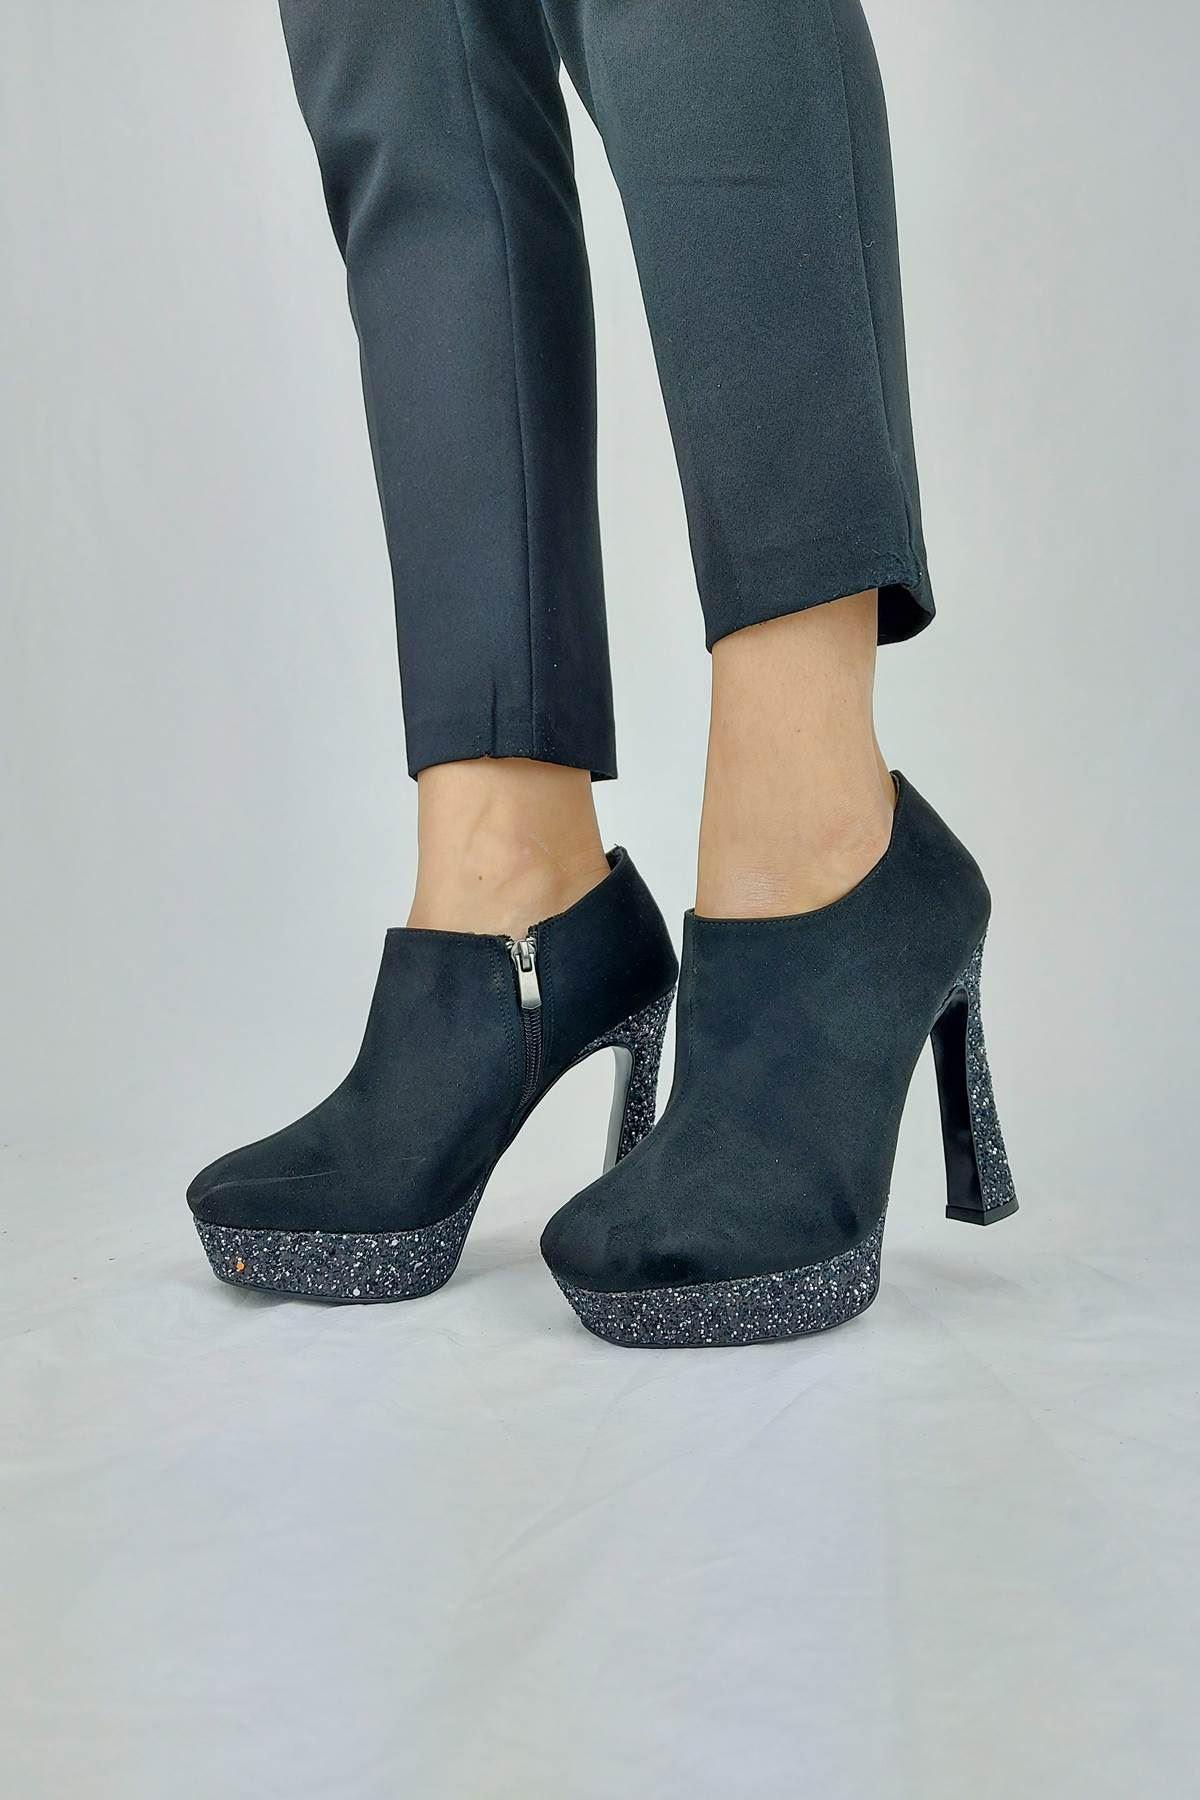 Cattle Siyah Süet - Platin Topuklu Kadın Bot